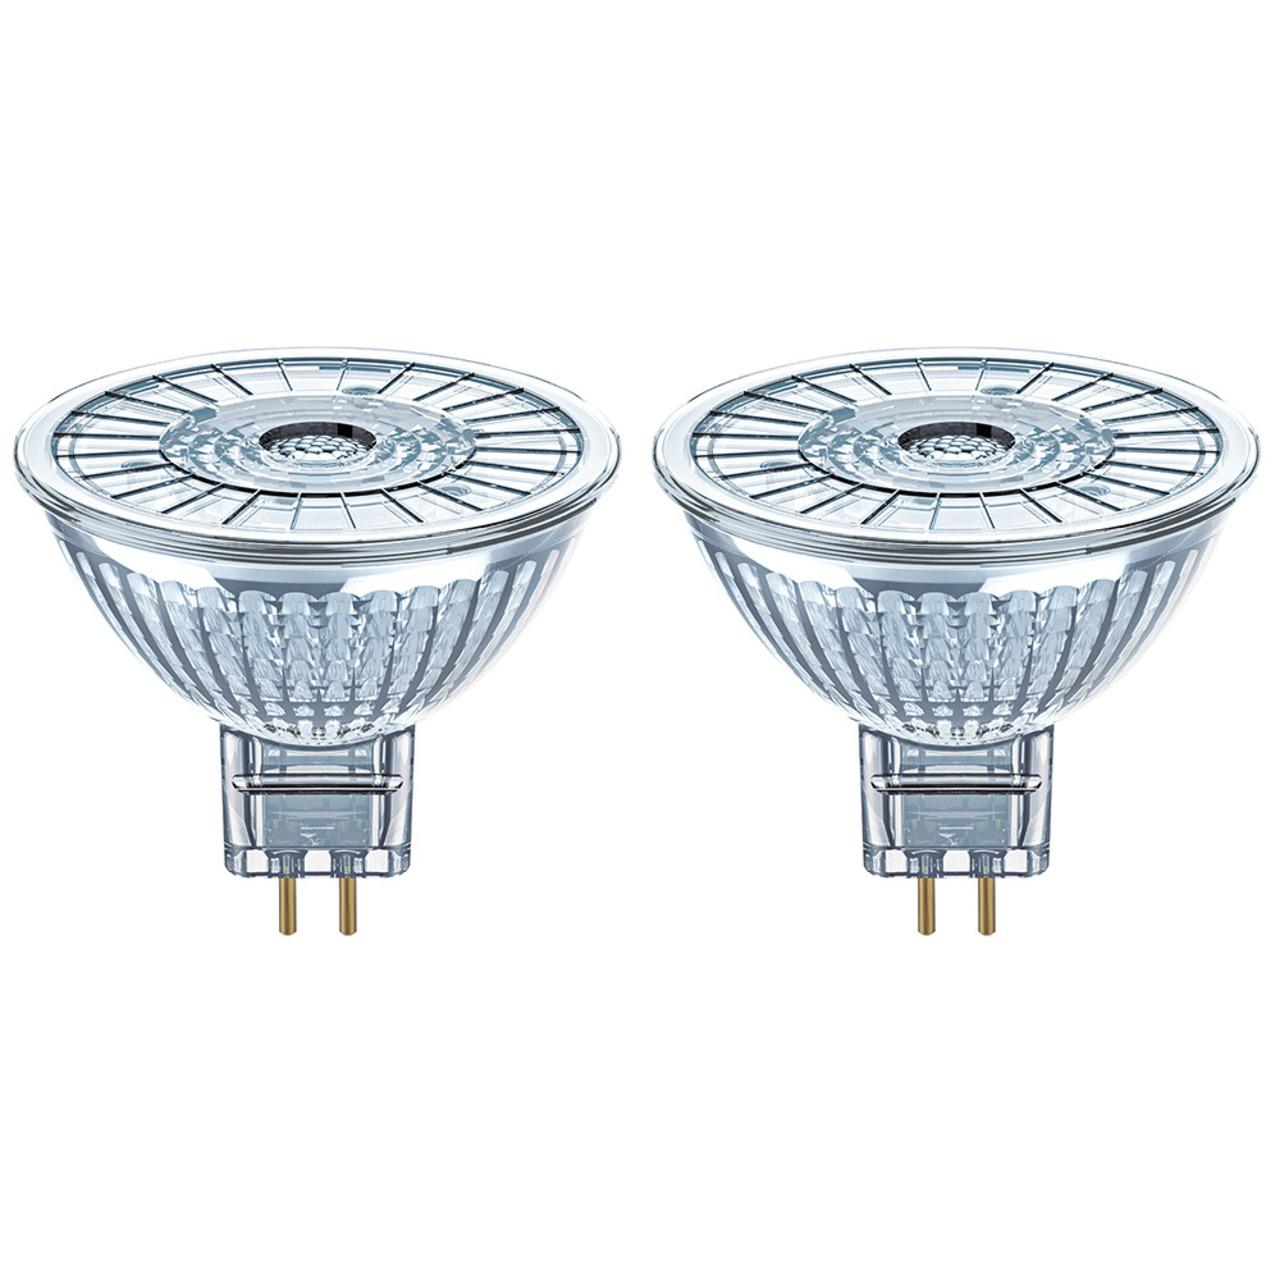 OSRAM LED MULTIPACK 2er Pack 3-8-W-GU5-3-LED-Lampen- warmweiss- 12 V